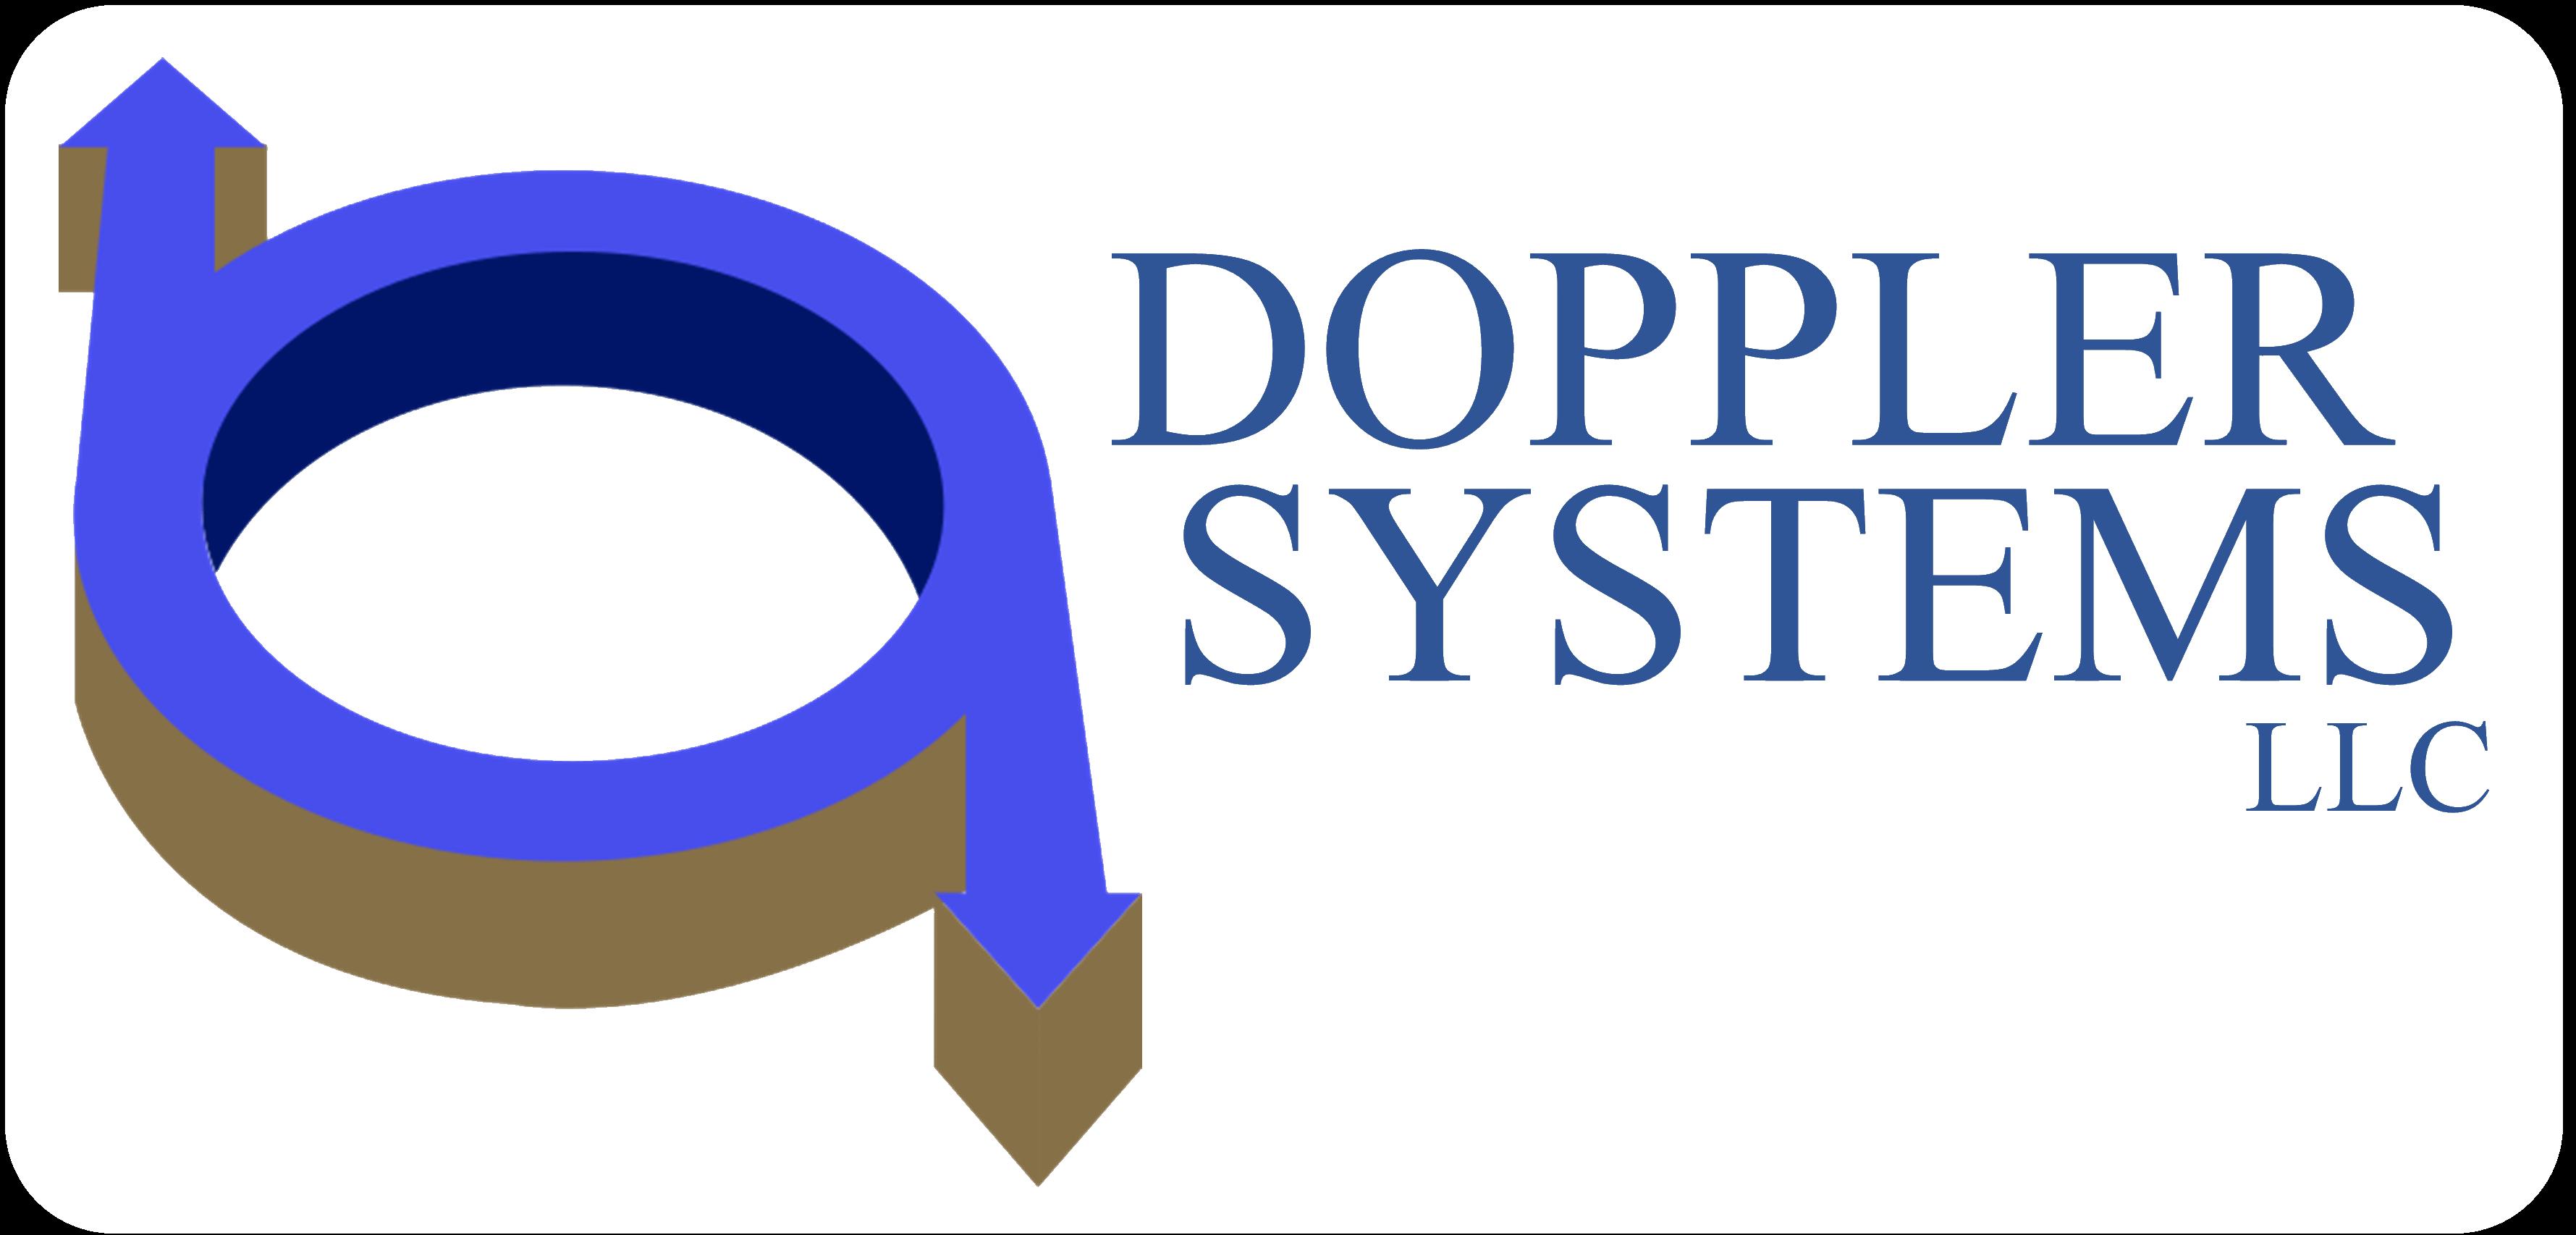 Doppler Systems, LLC